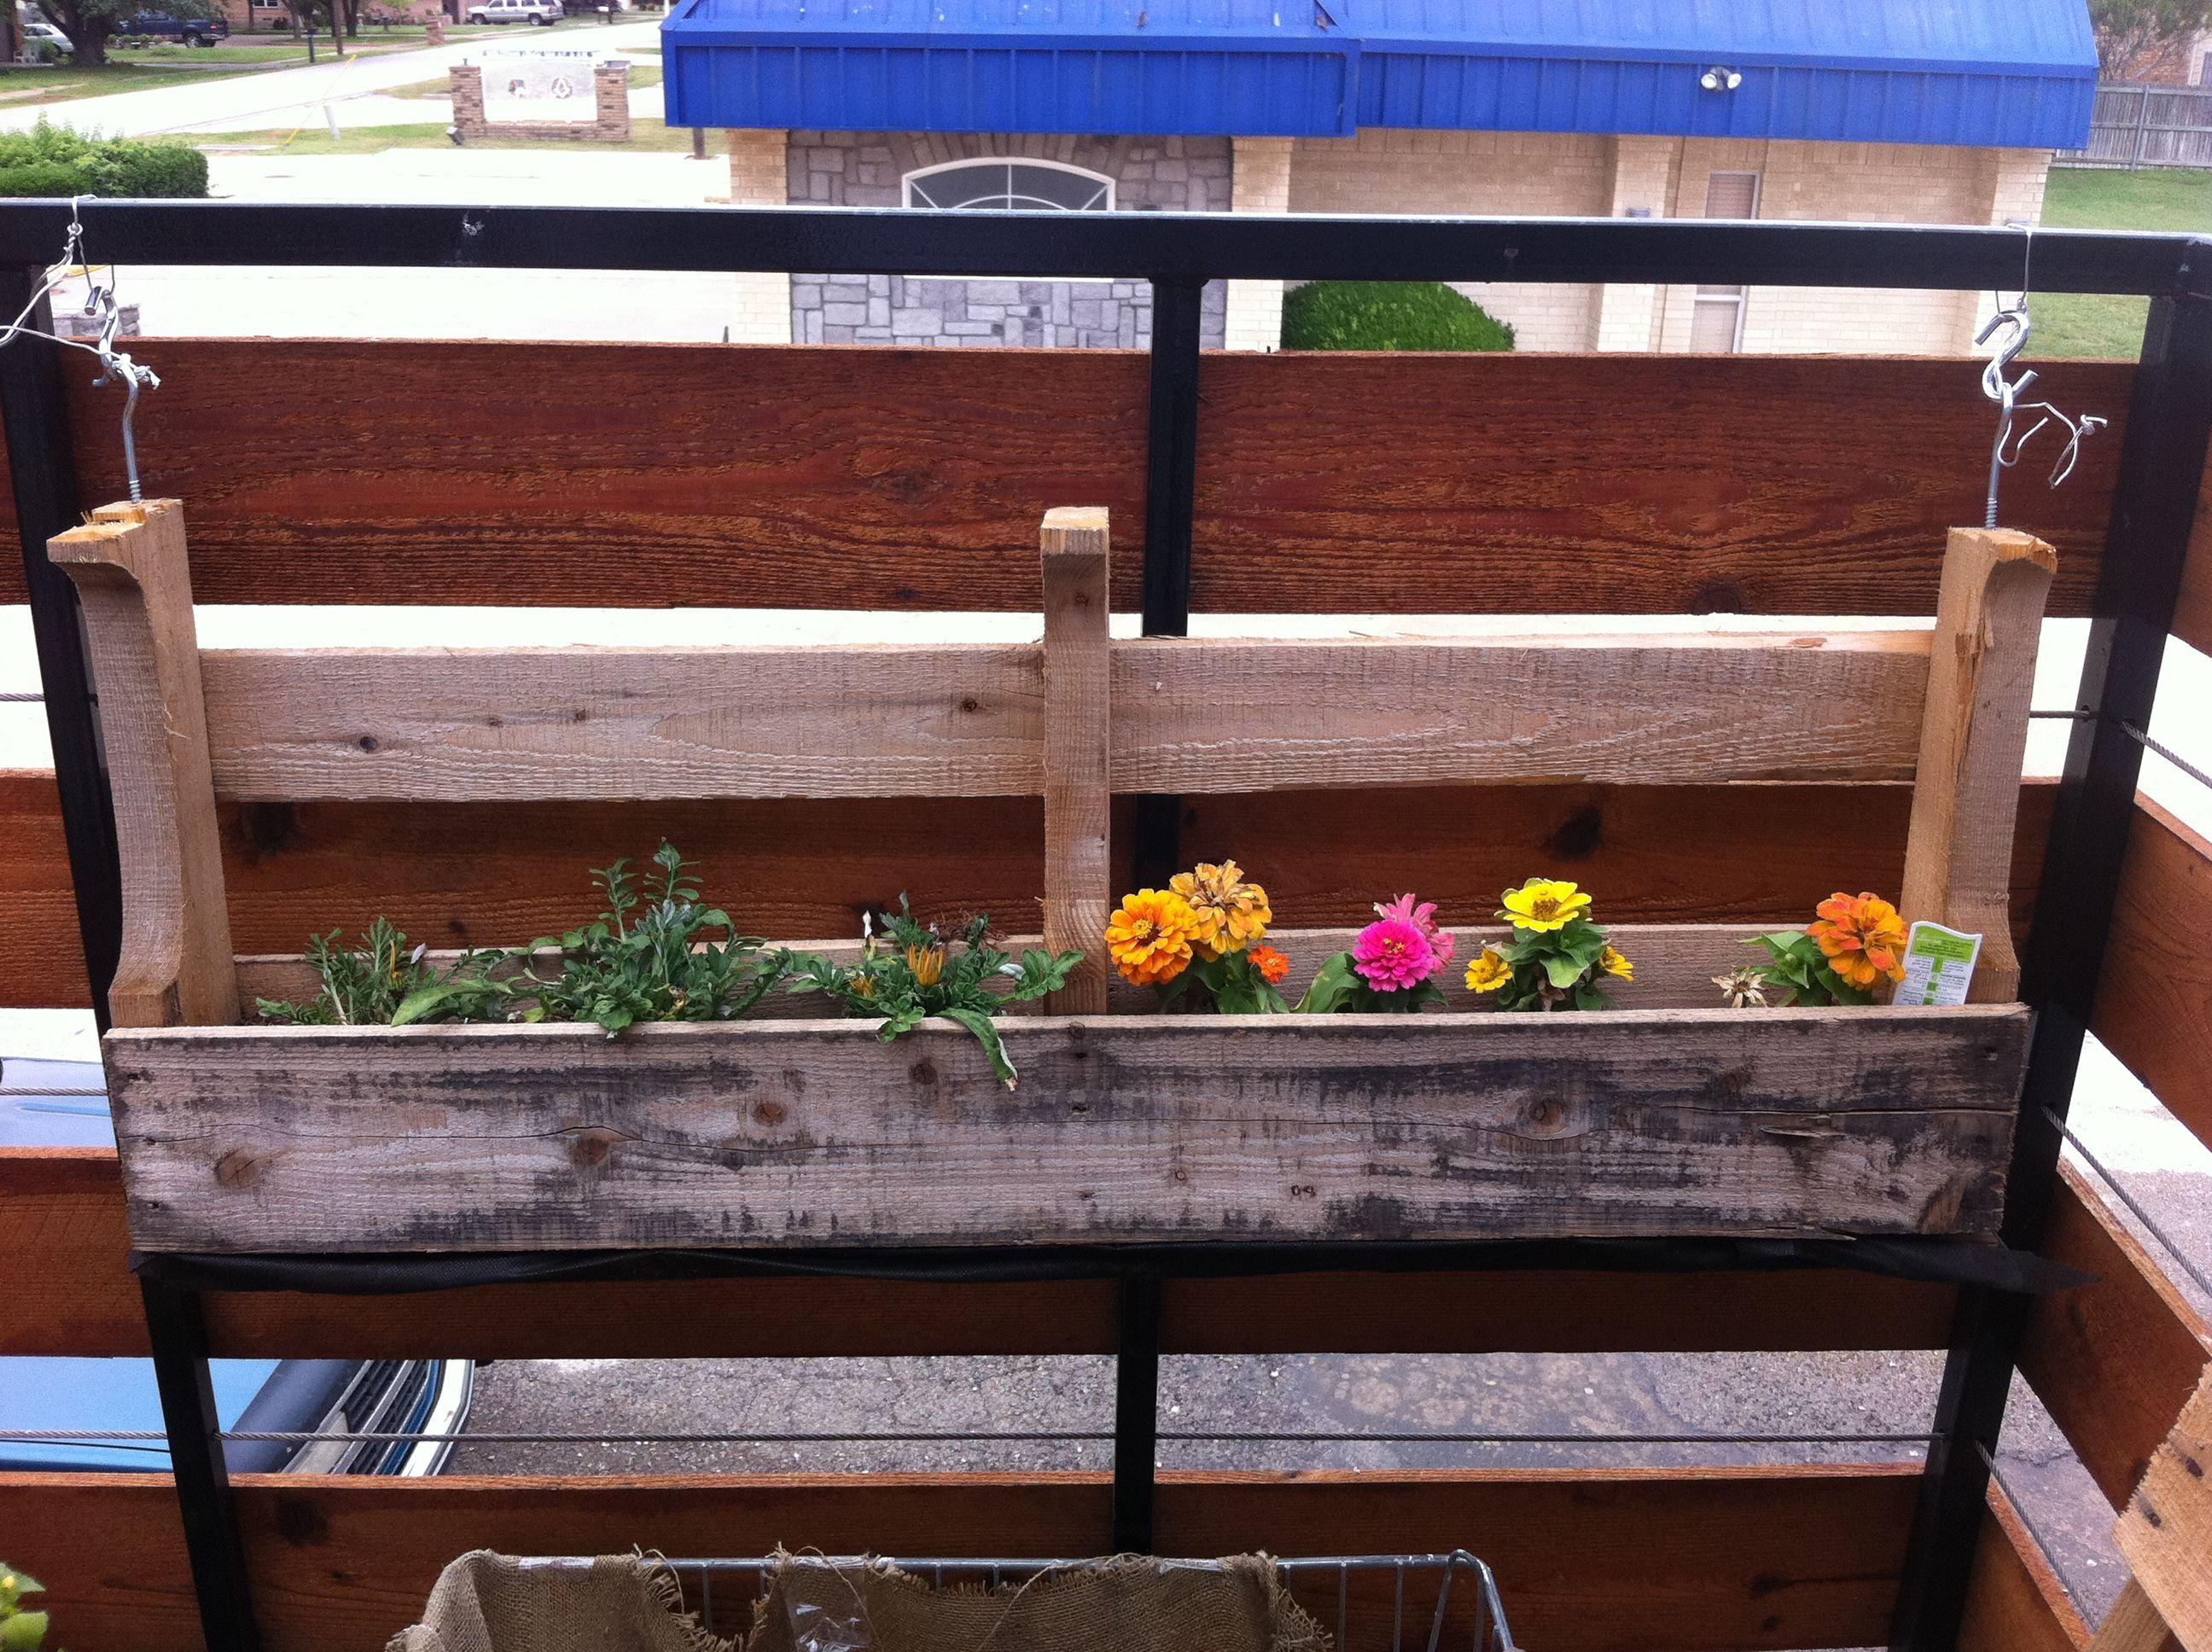 Diy flower box diy wood planters hanging planter boxes